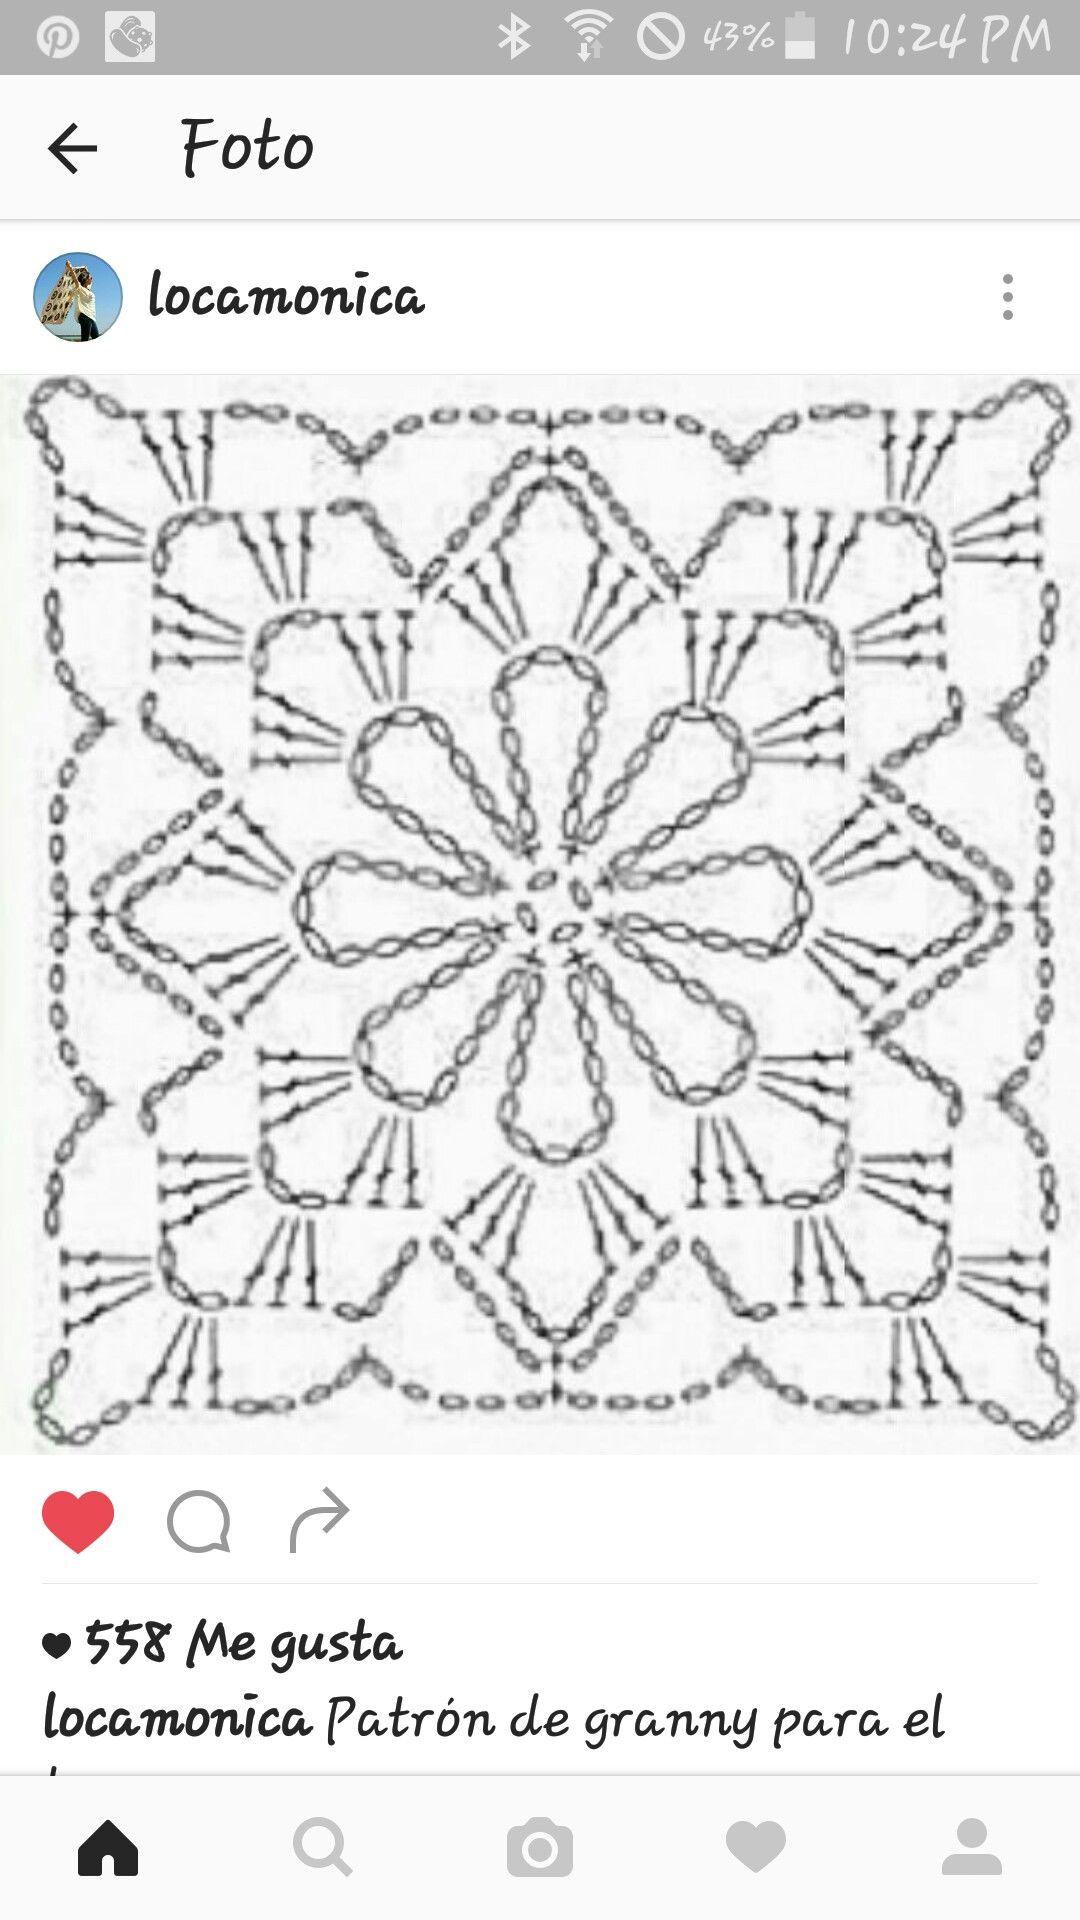 Pin de Mislaidys Morejon en Nuevo | Pinterest | Manualidades en ...